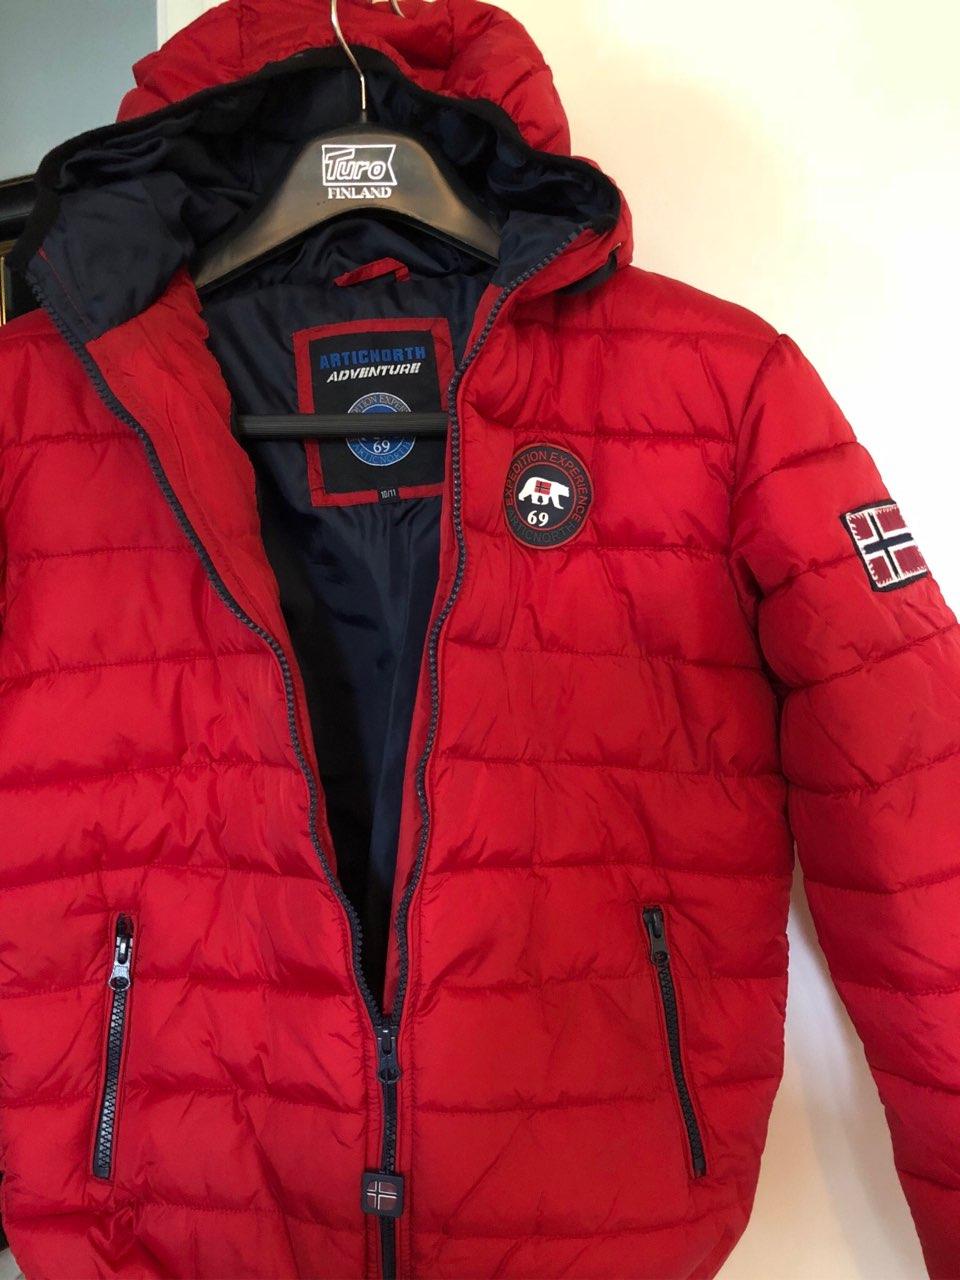 Artic North jakke • Tise